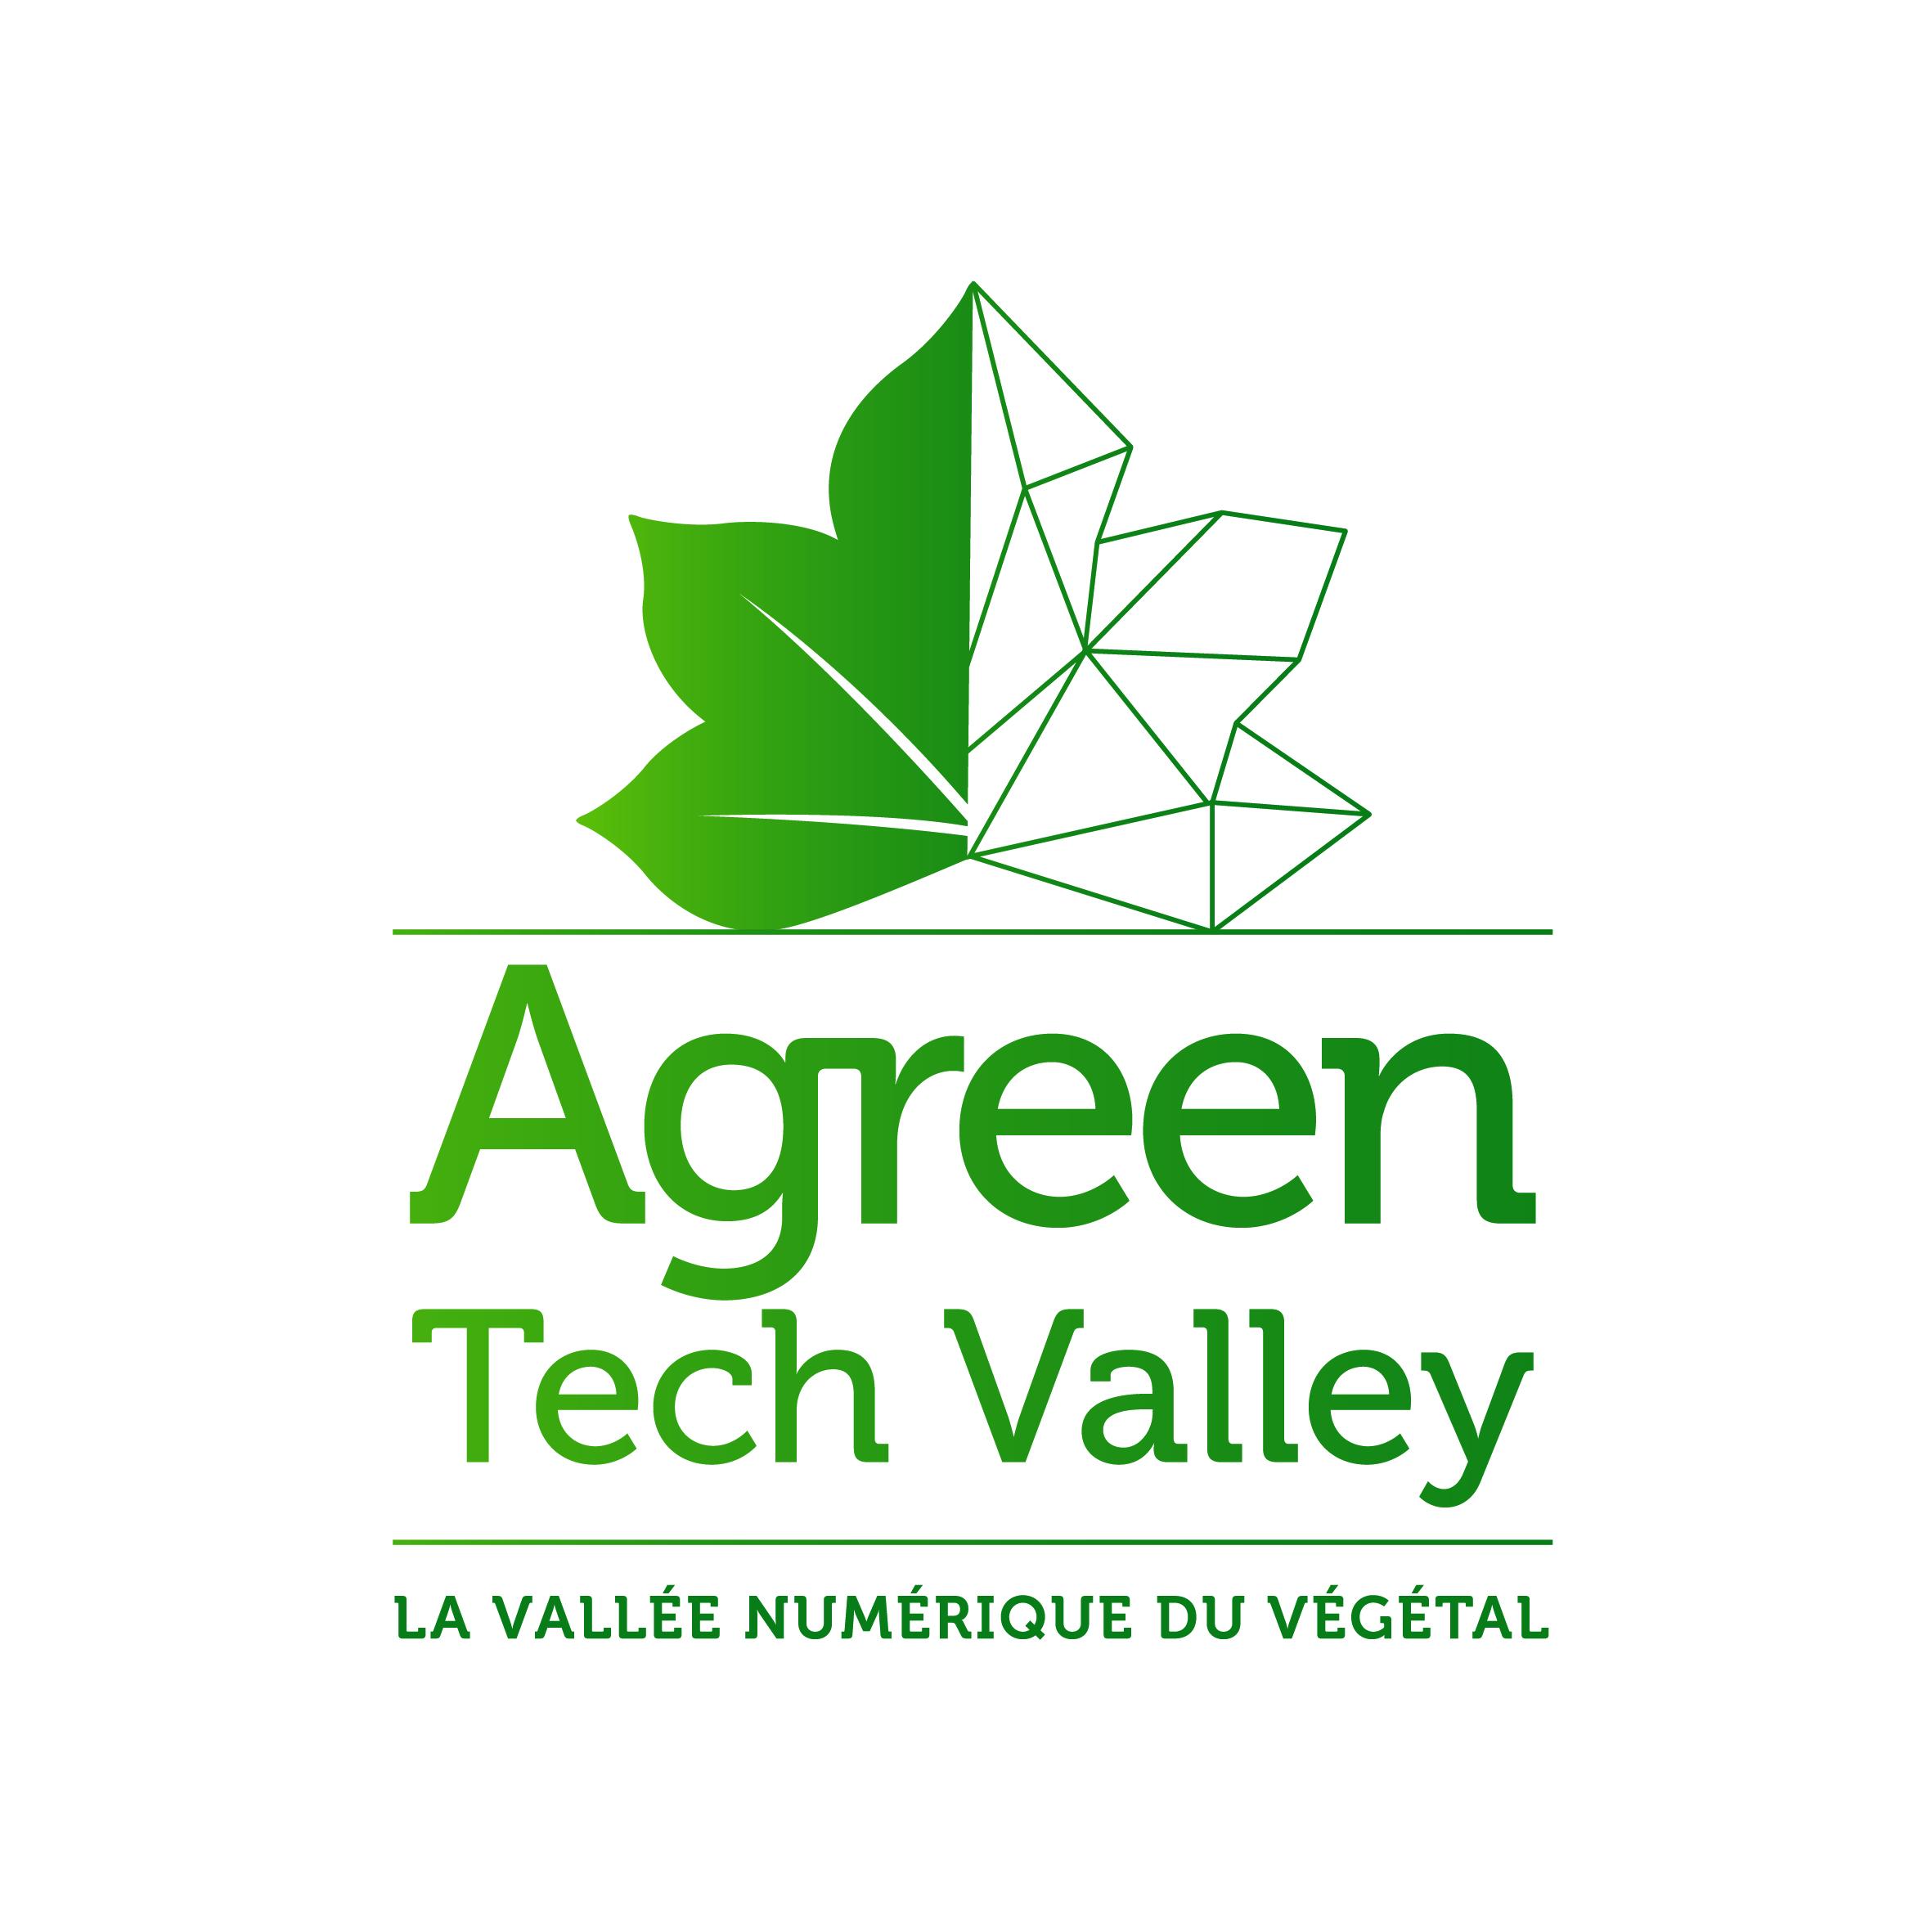 tlg pro membre d'Agreen Tech Valley